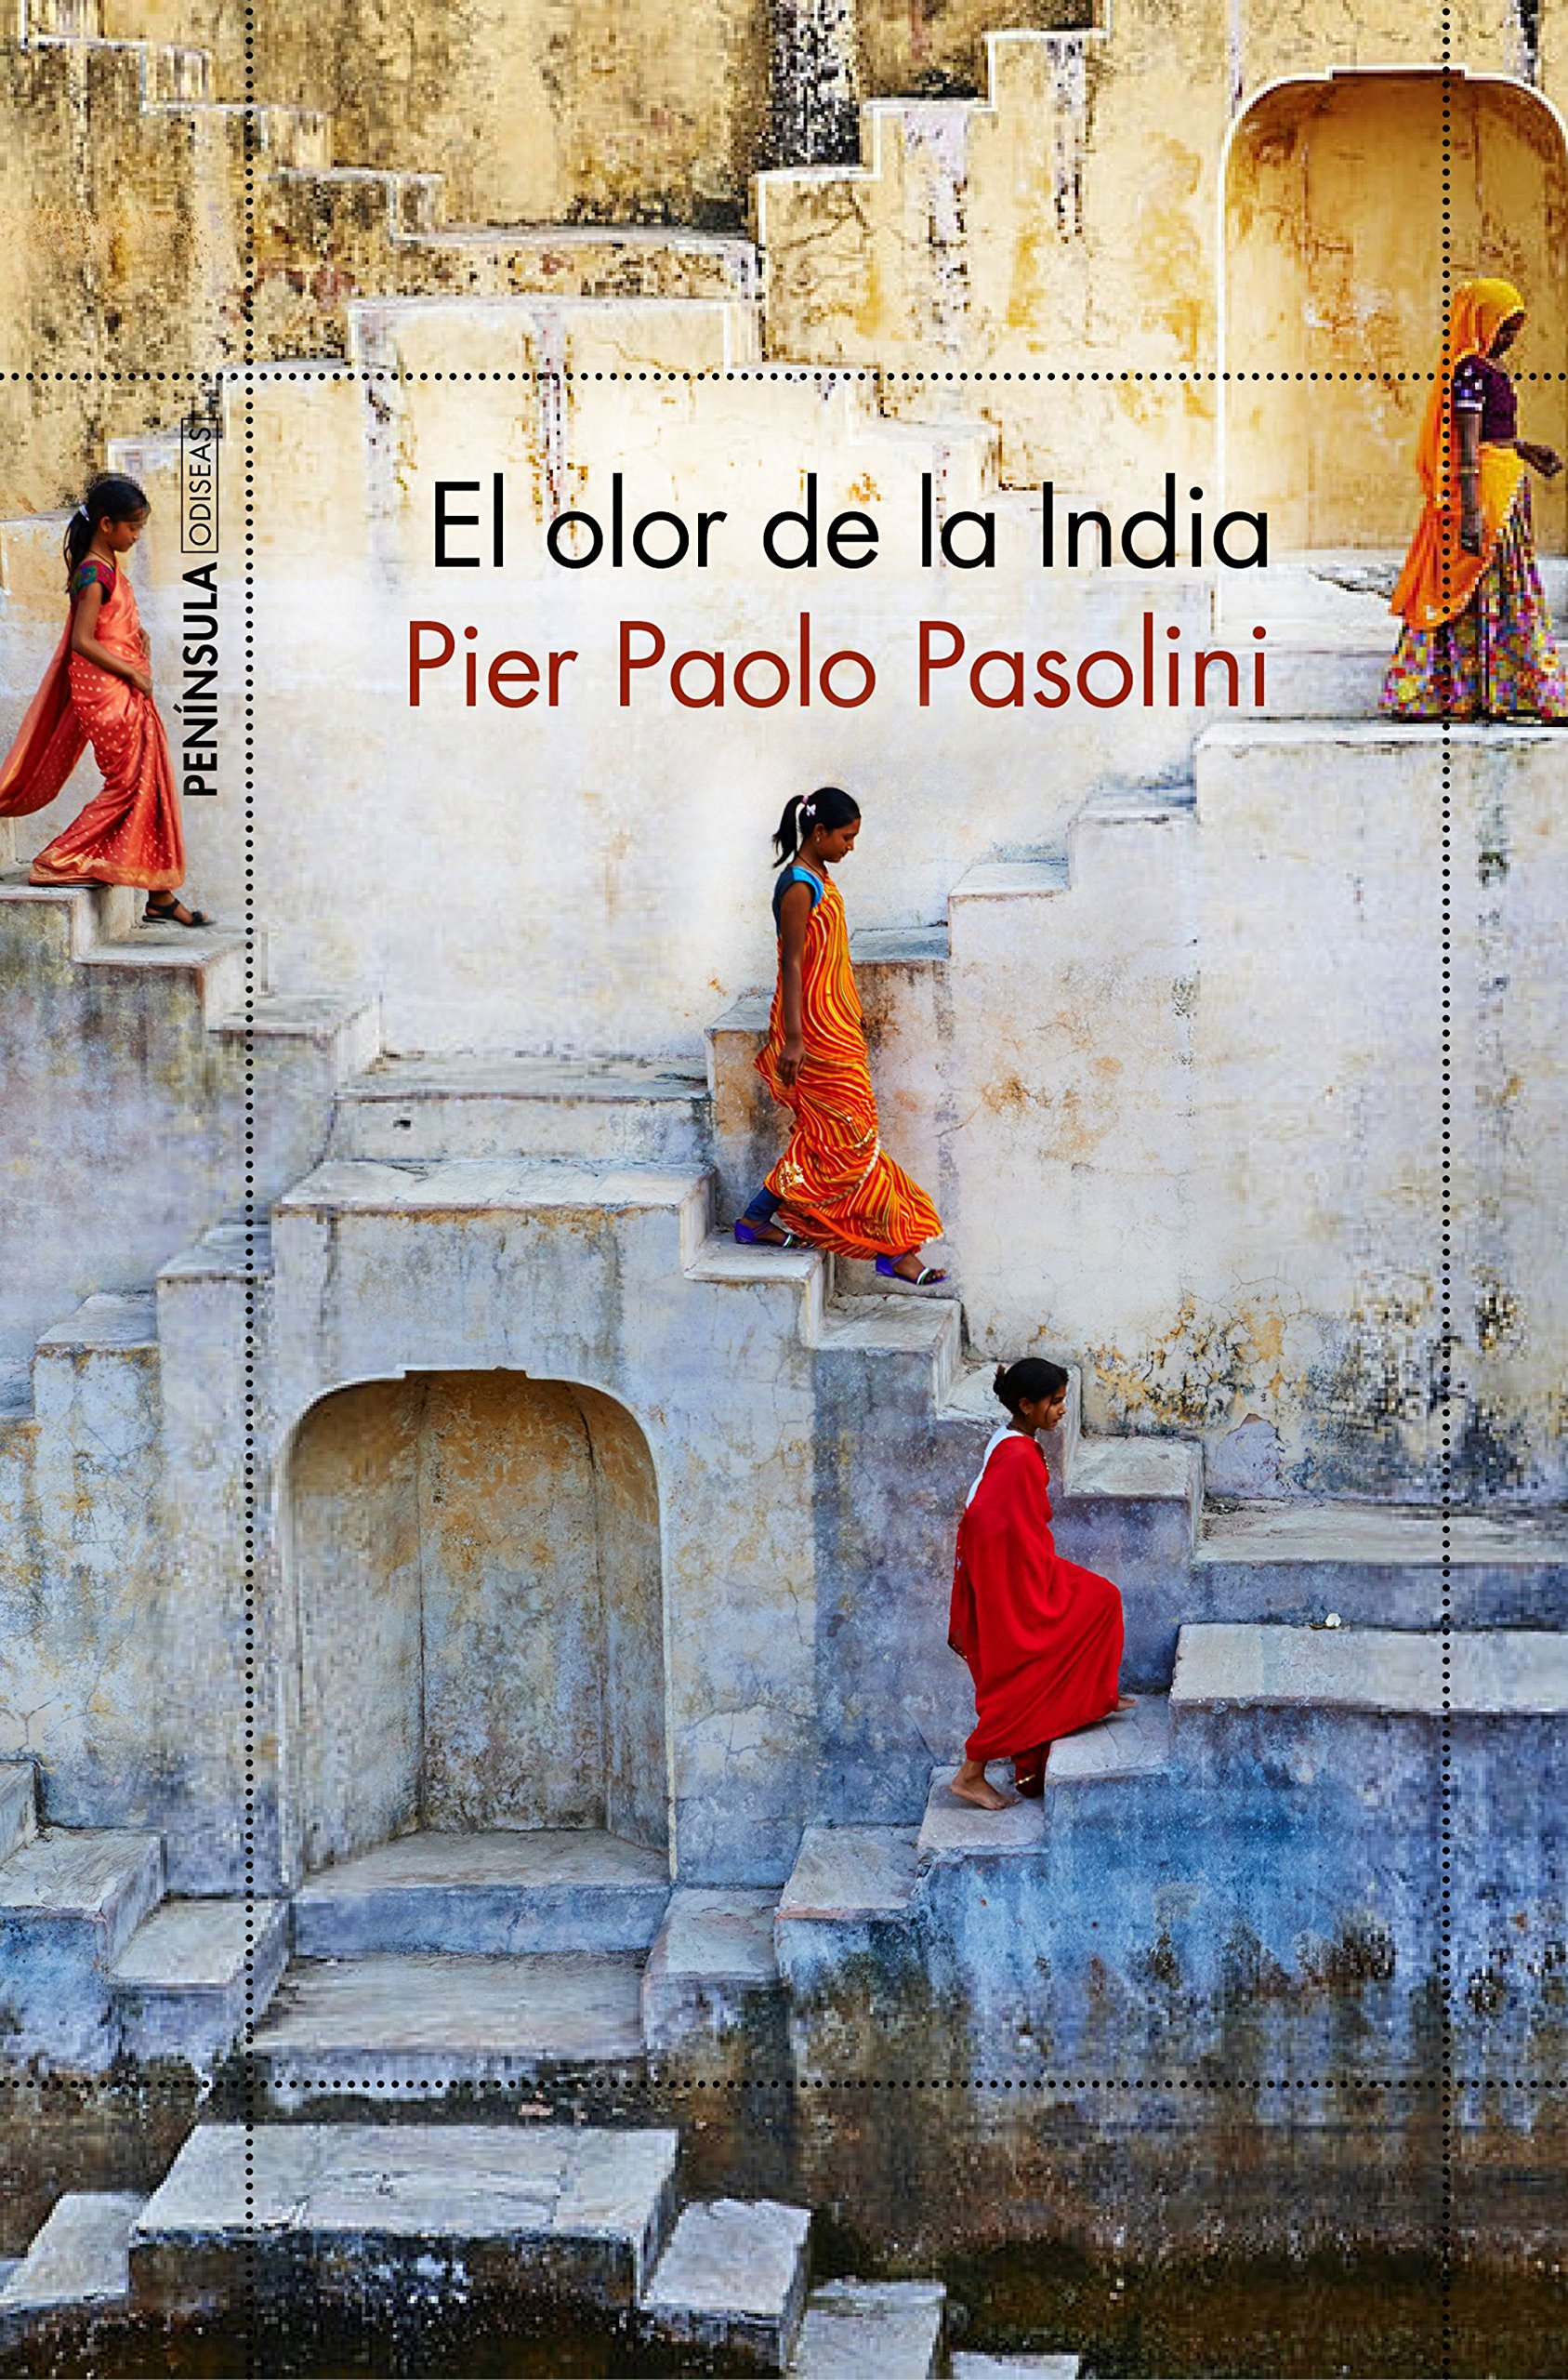 El olor de la India (ODISEAS): Amazon.es: Pier Paolo Pasolini, Atilio  Pentimalli Melacrino, Helena Aguilà: Libros